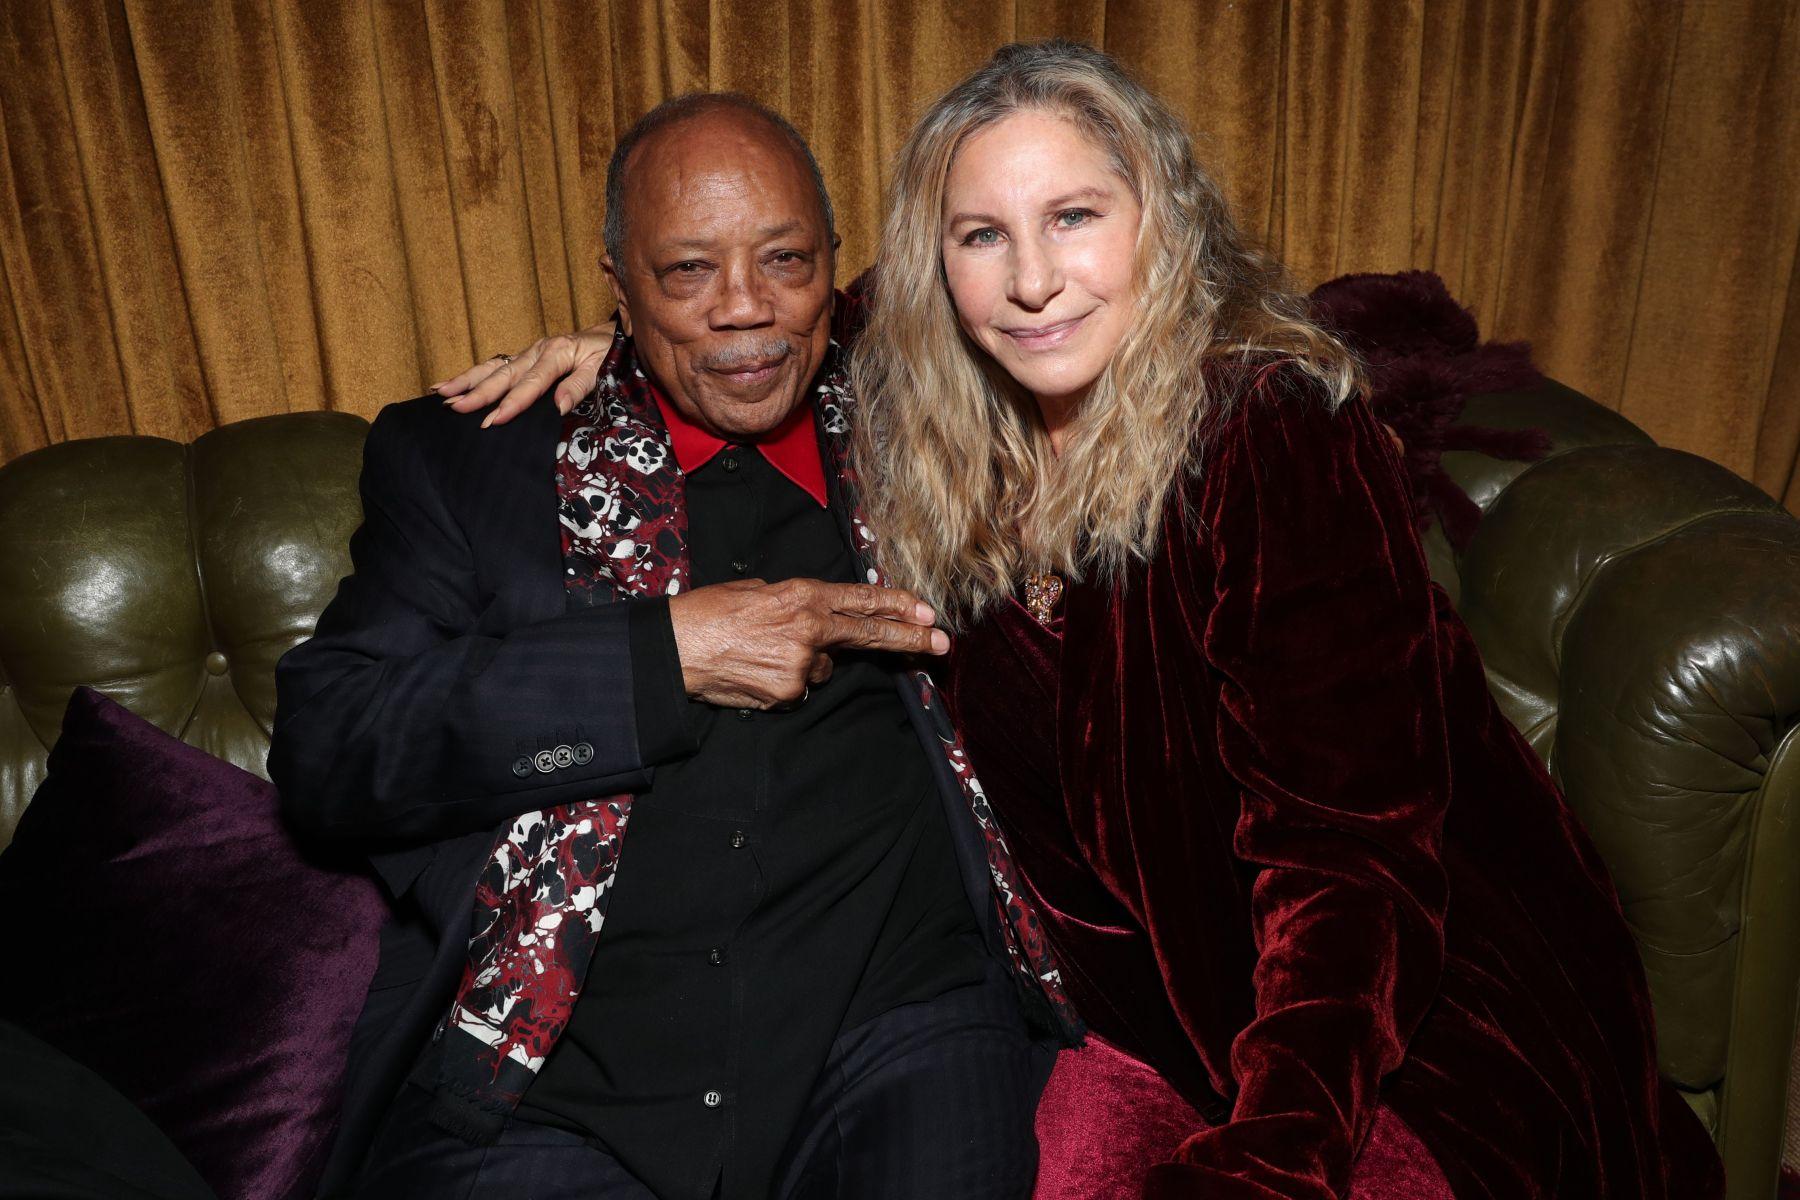 call for code Quincy Jones and Barbra StreisandAmazon Studios Holiday Party, Inside, Los Angeles, USA - 09 Dec 2017